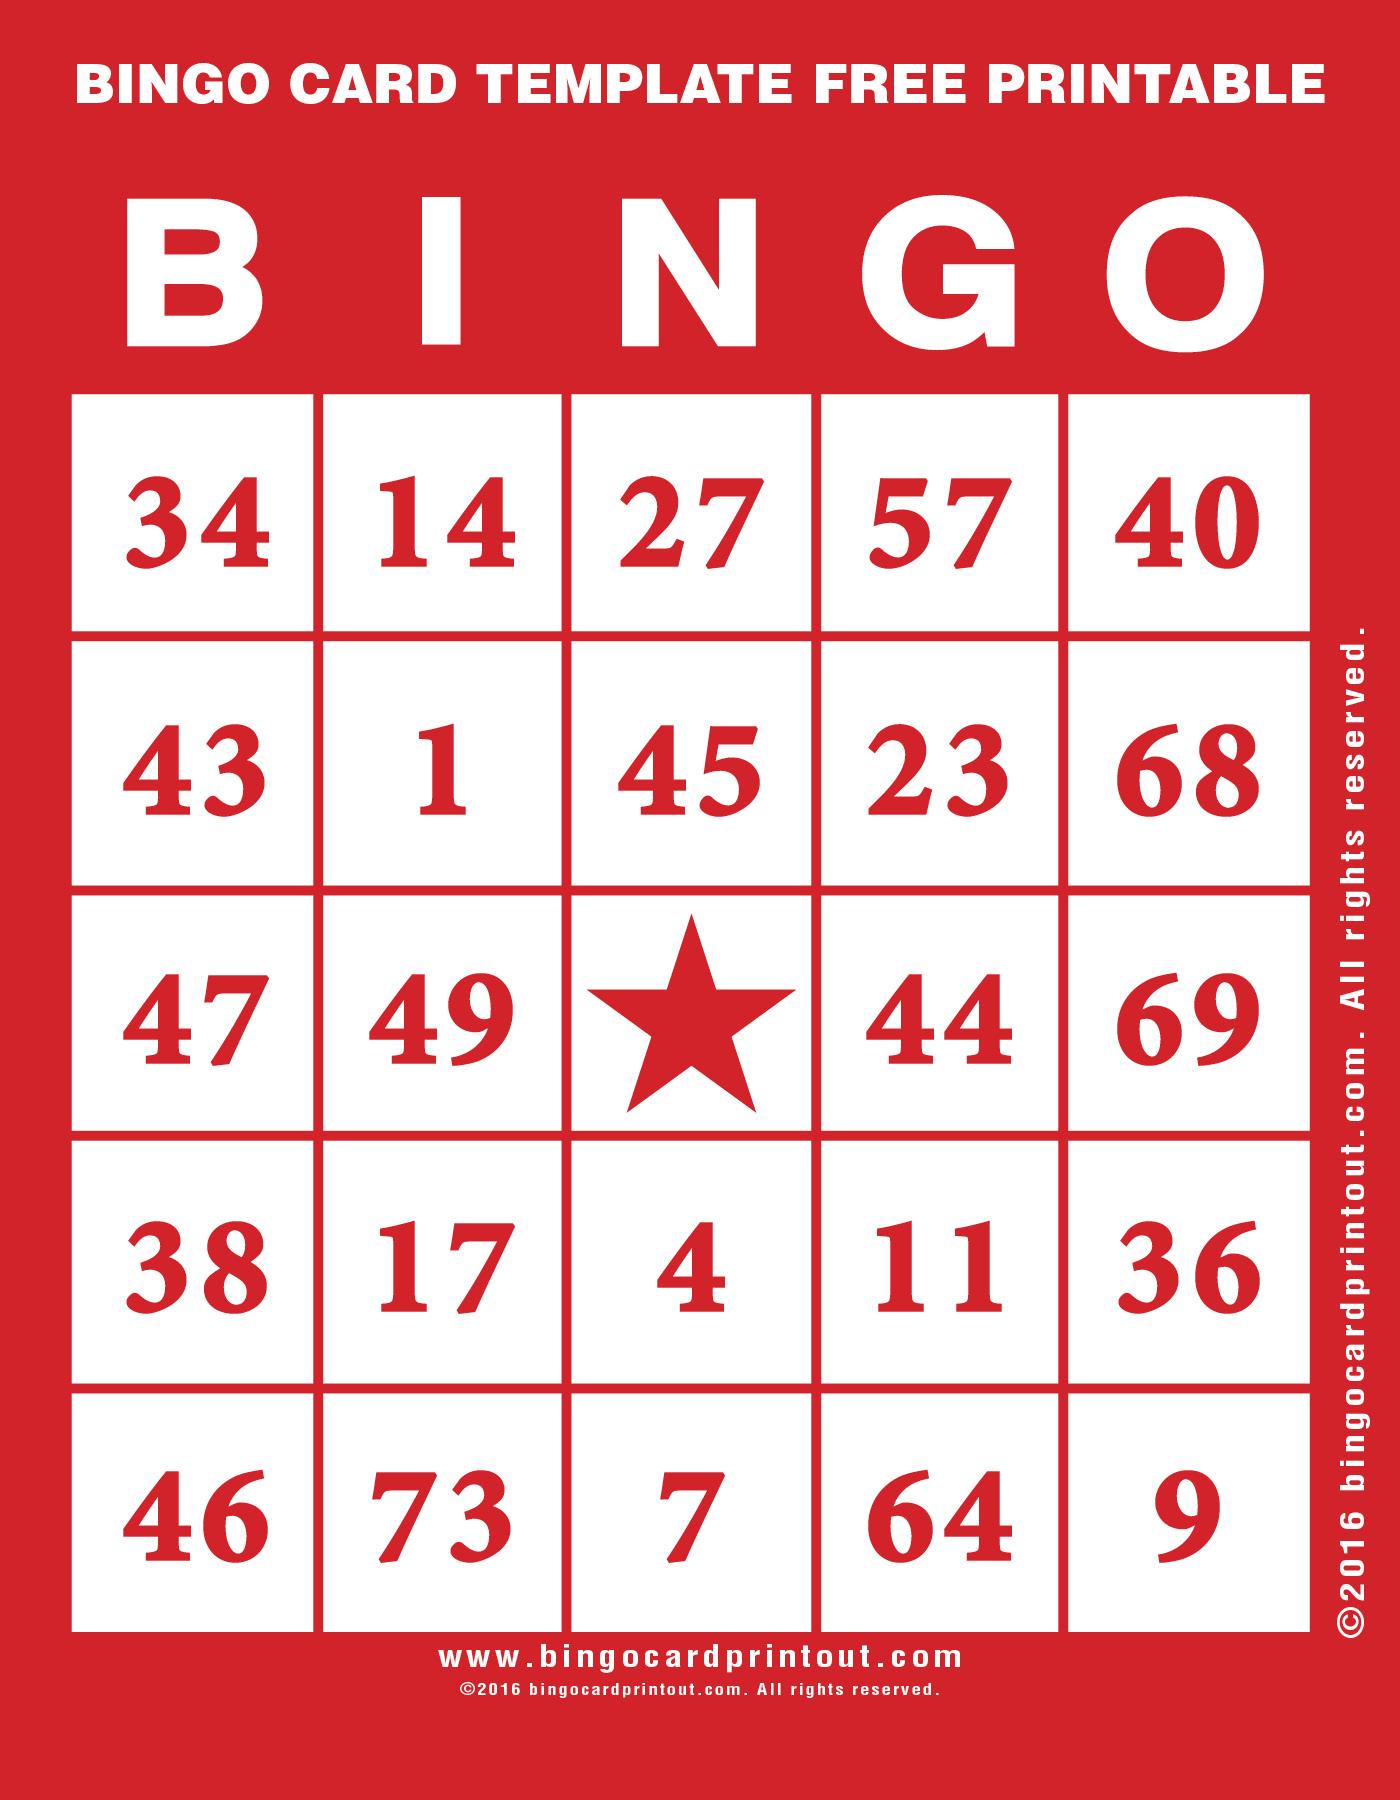 Bingo Card Template Free Printable - Bingocardprintout